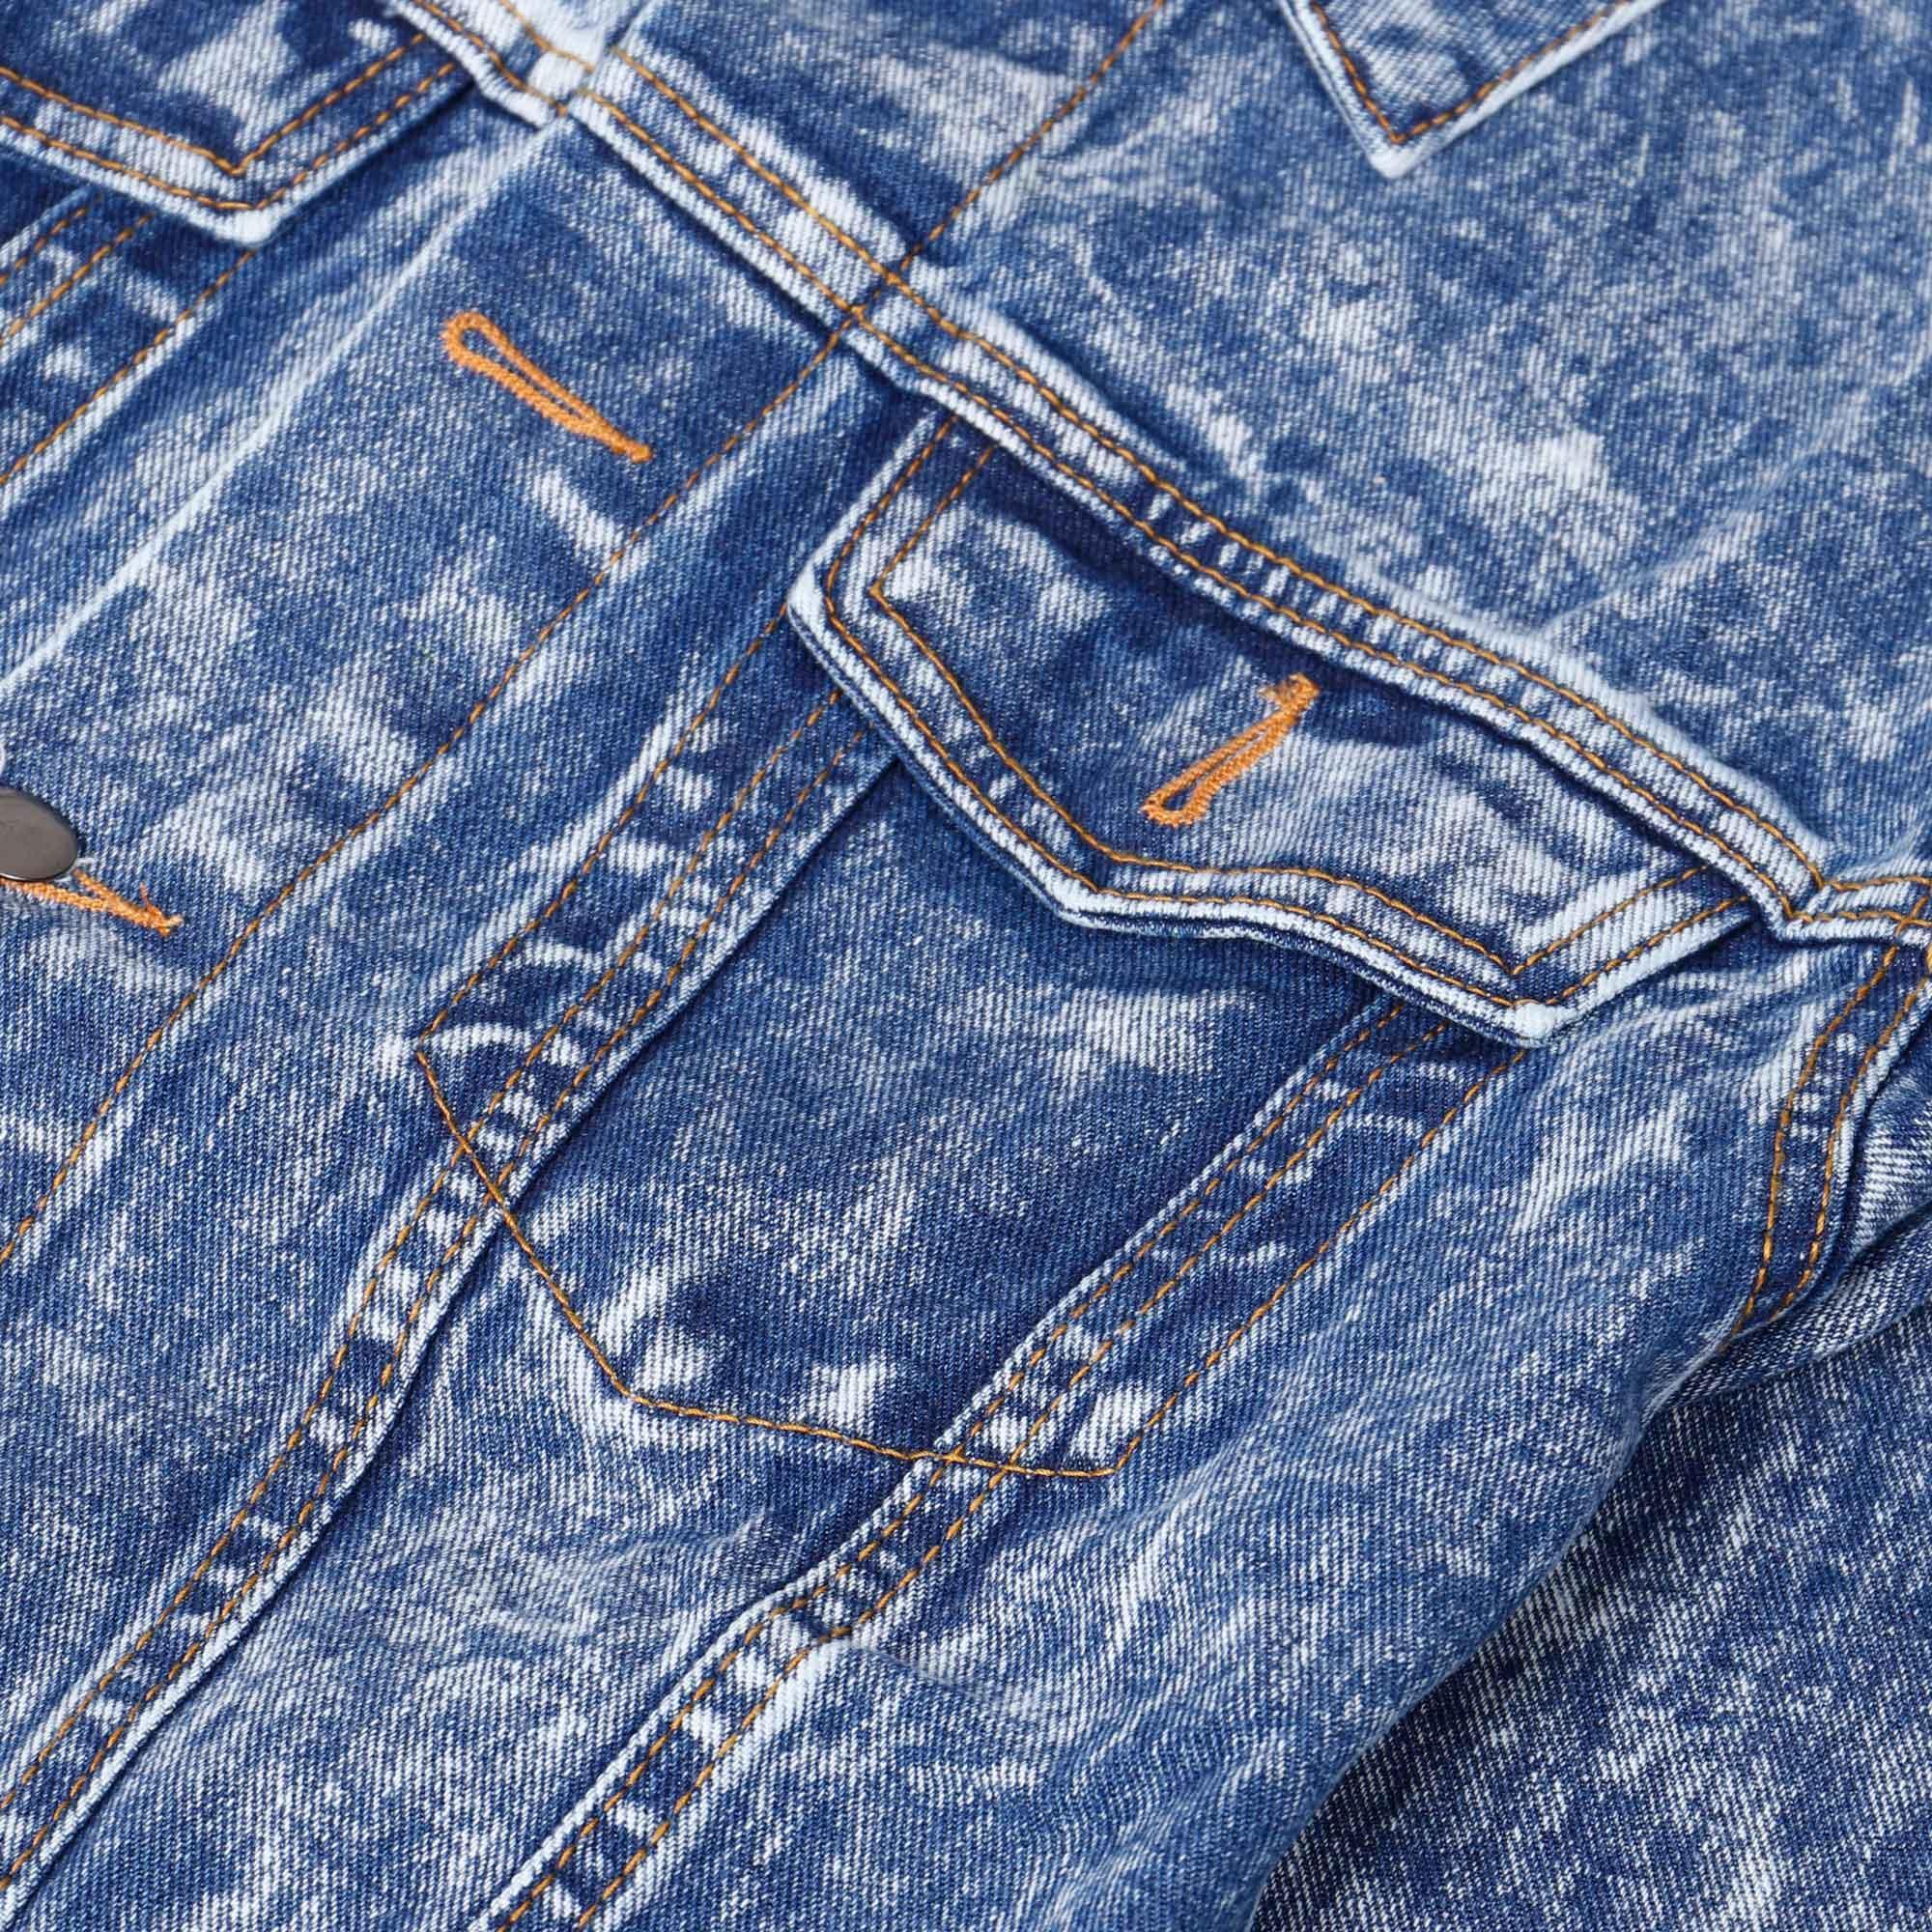 Fitur Broodis Jaket Blue Denim Trucker Wash Best Seller Dan Harga Bomber Casual  Official Store 3